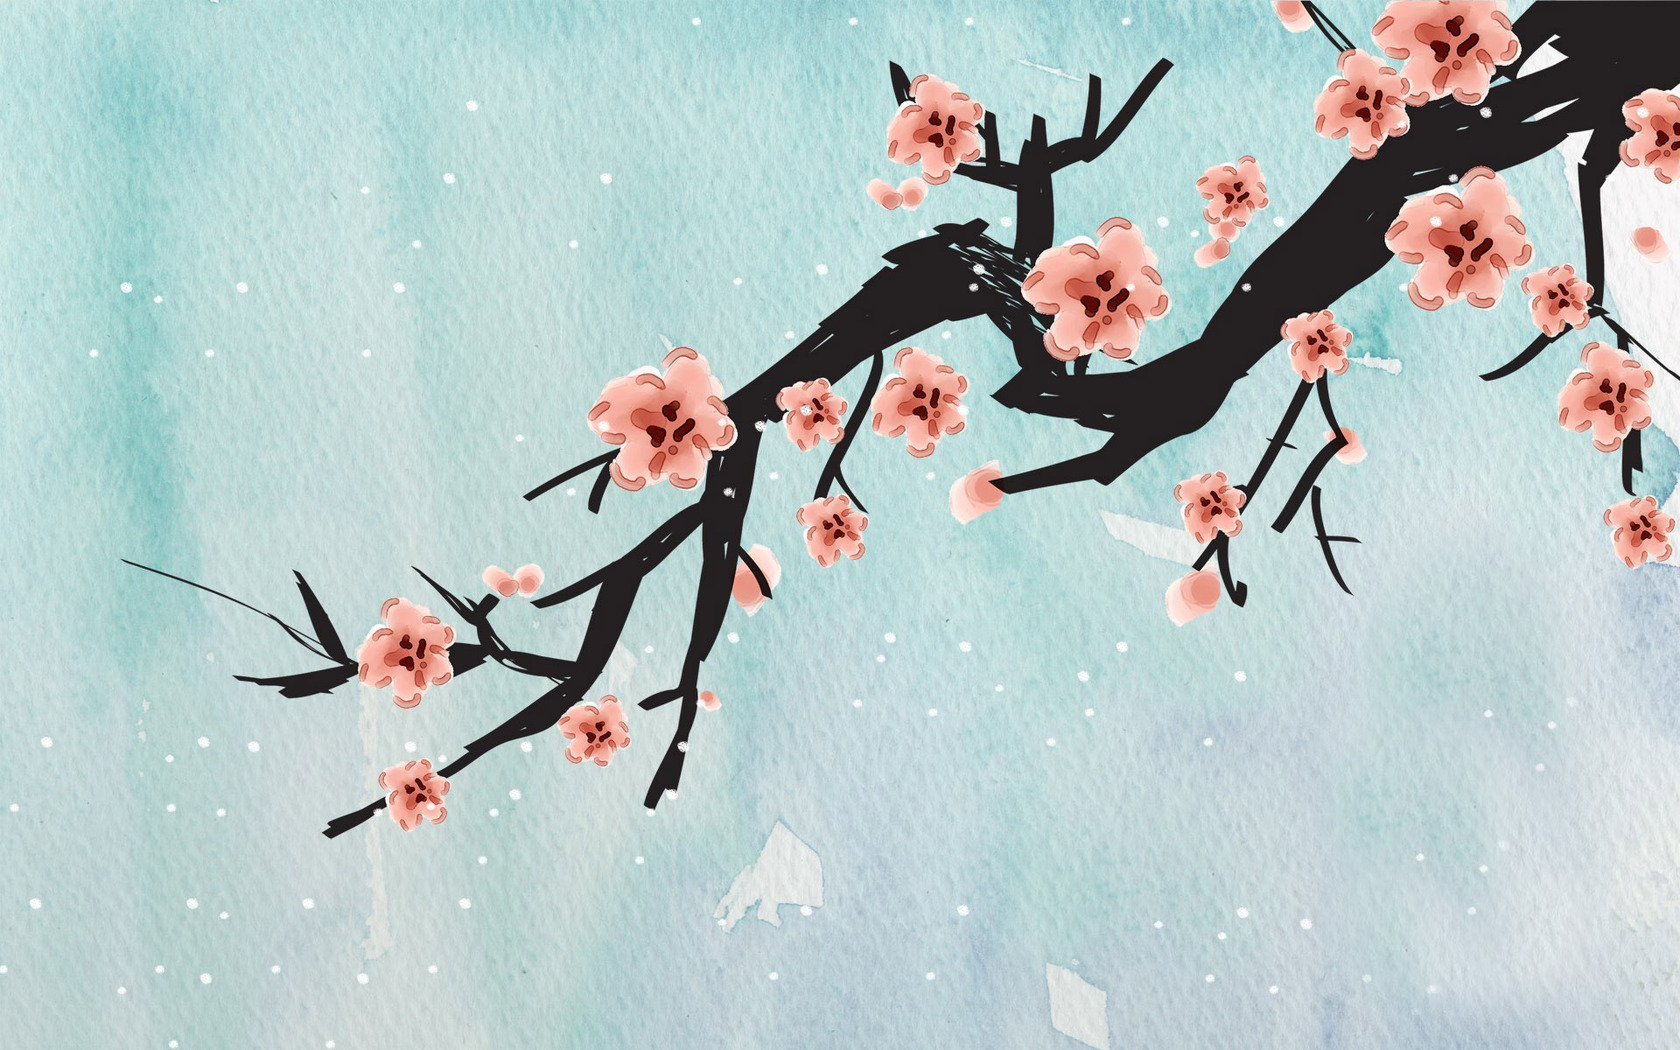 sakura-branch-17198